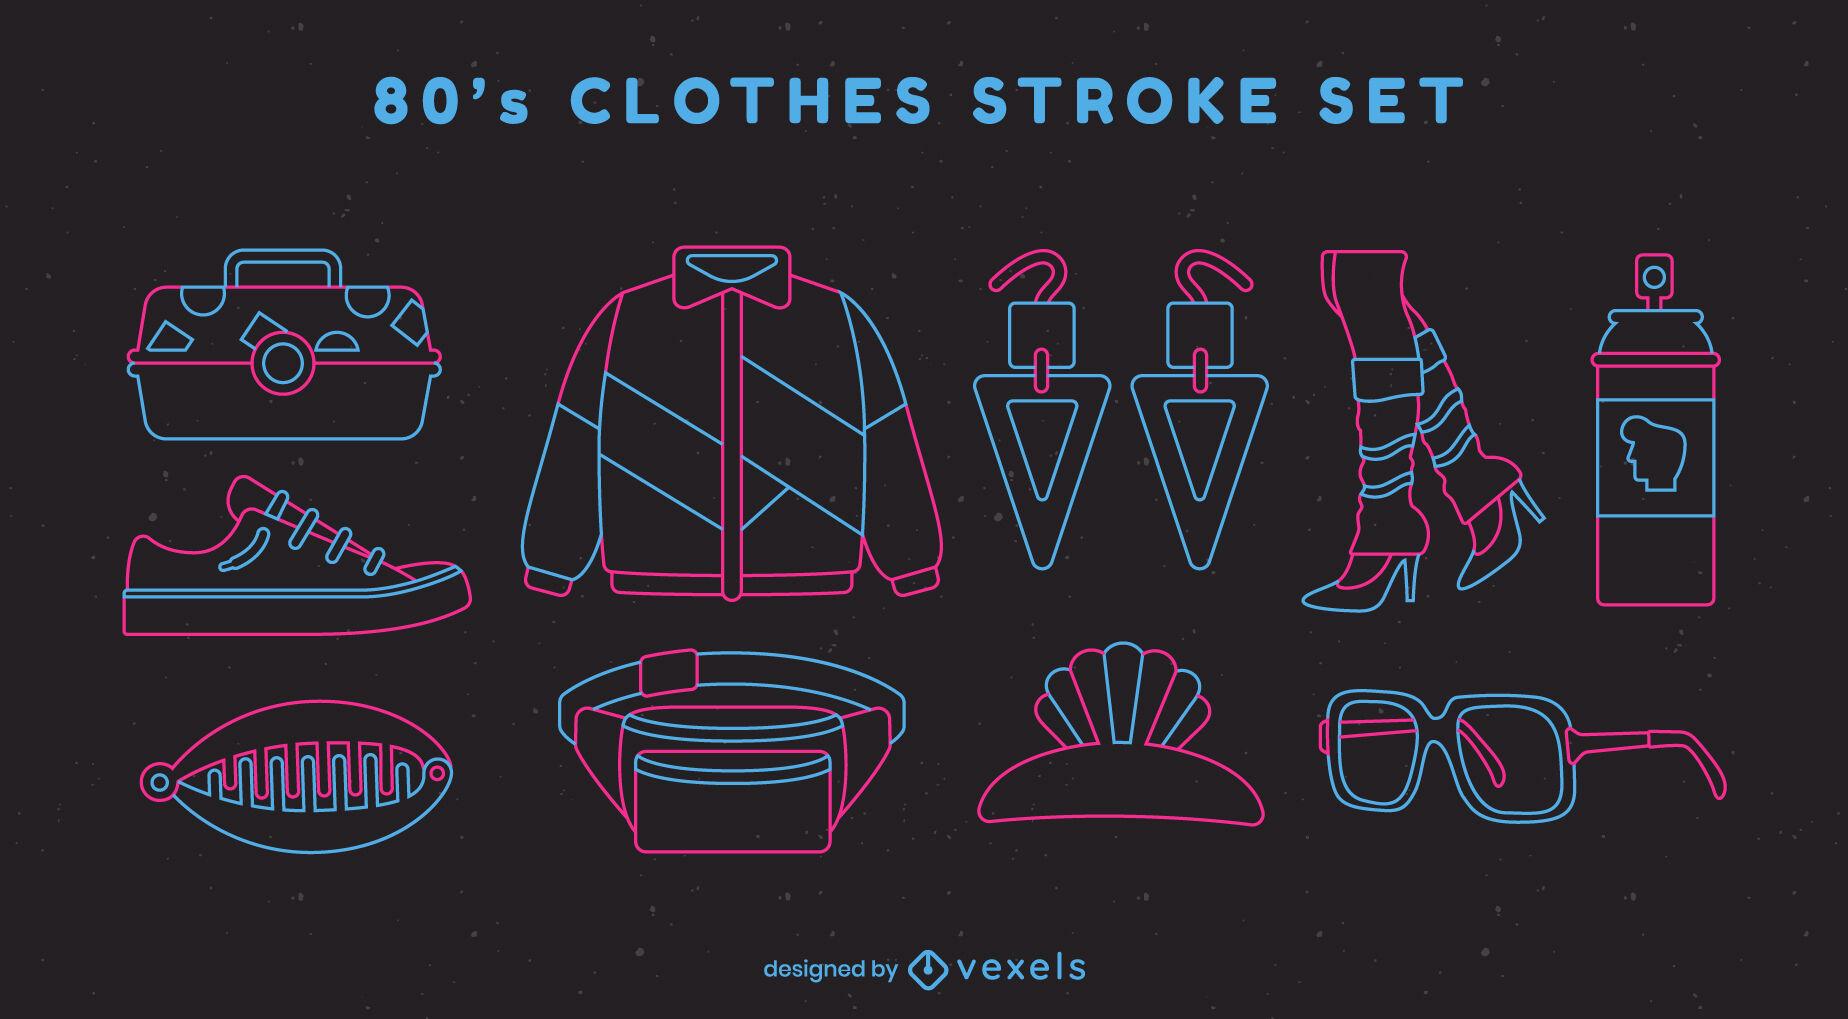 80s clothing stroke set